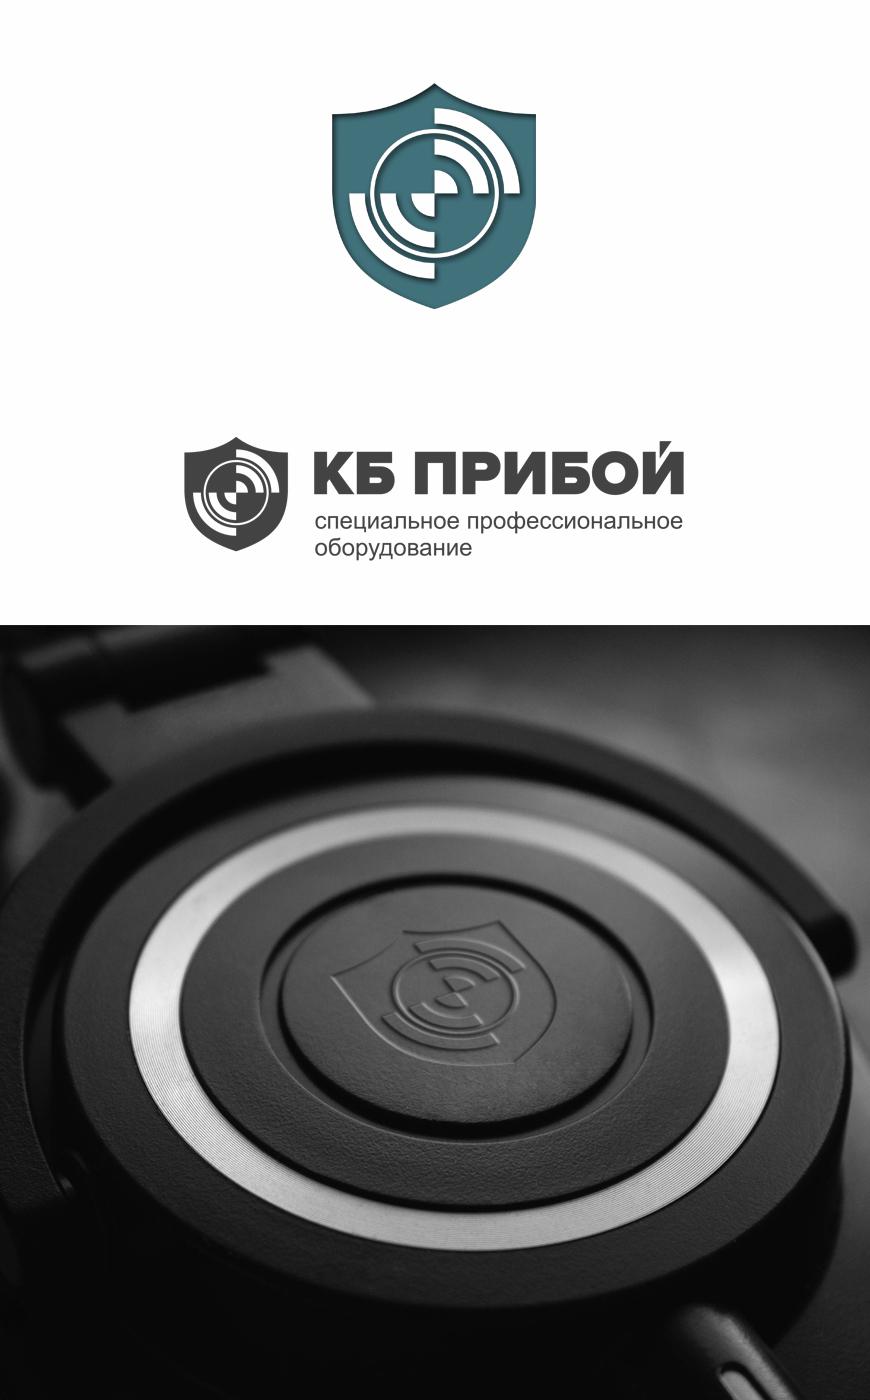 Разработка логотипа и фирменного стиля для КБ Прибой фото f_4865b2b4f775216f.jpg